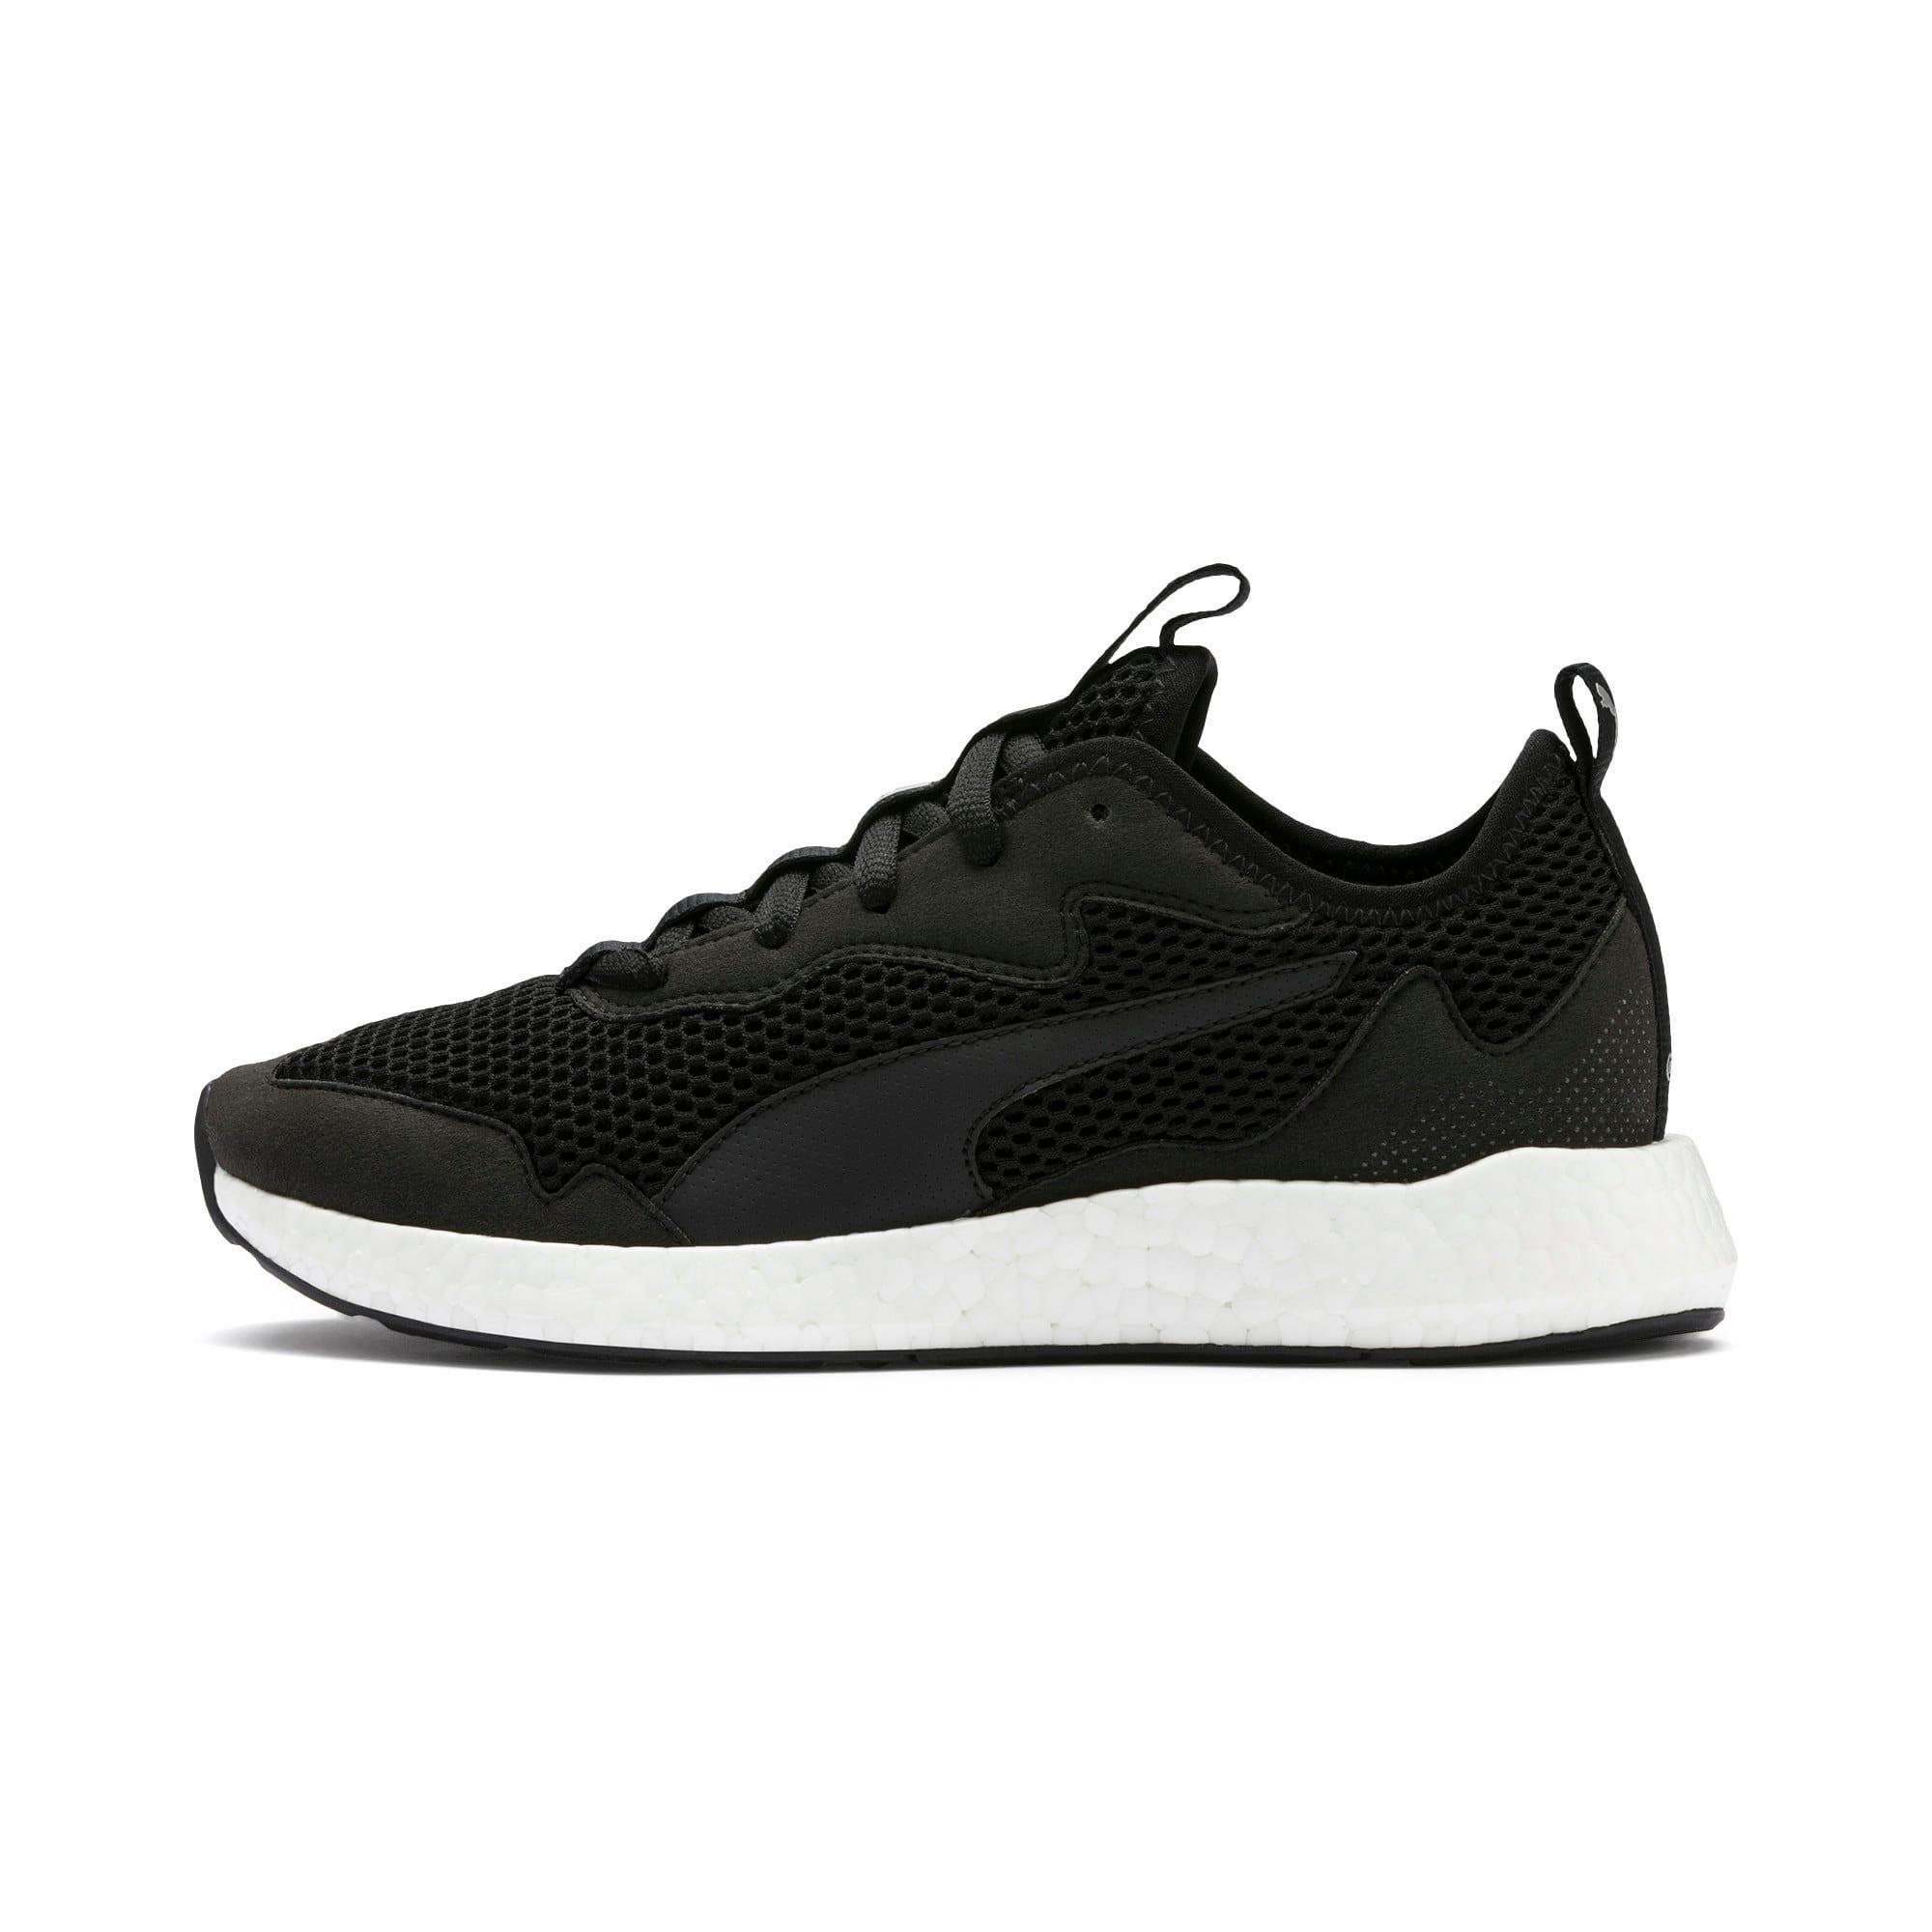 Thumbnail 1 of NRGY Neko Skim Women's Running Shoes, Puma Black-Puma Silver, medium-IND